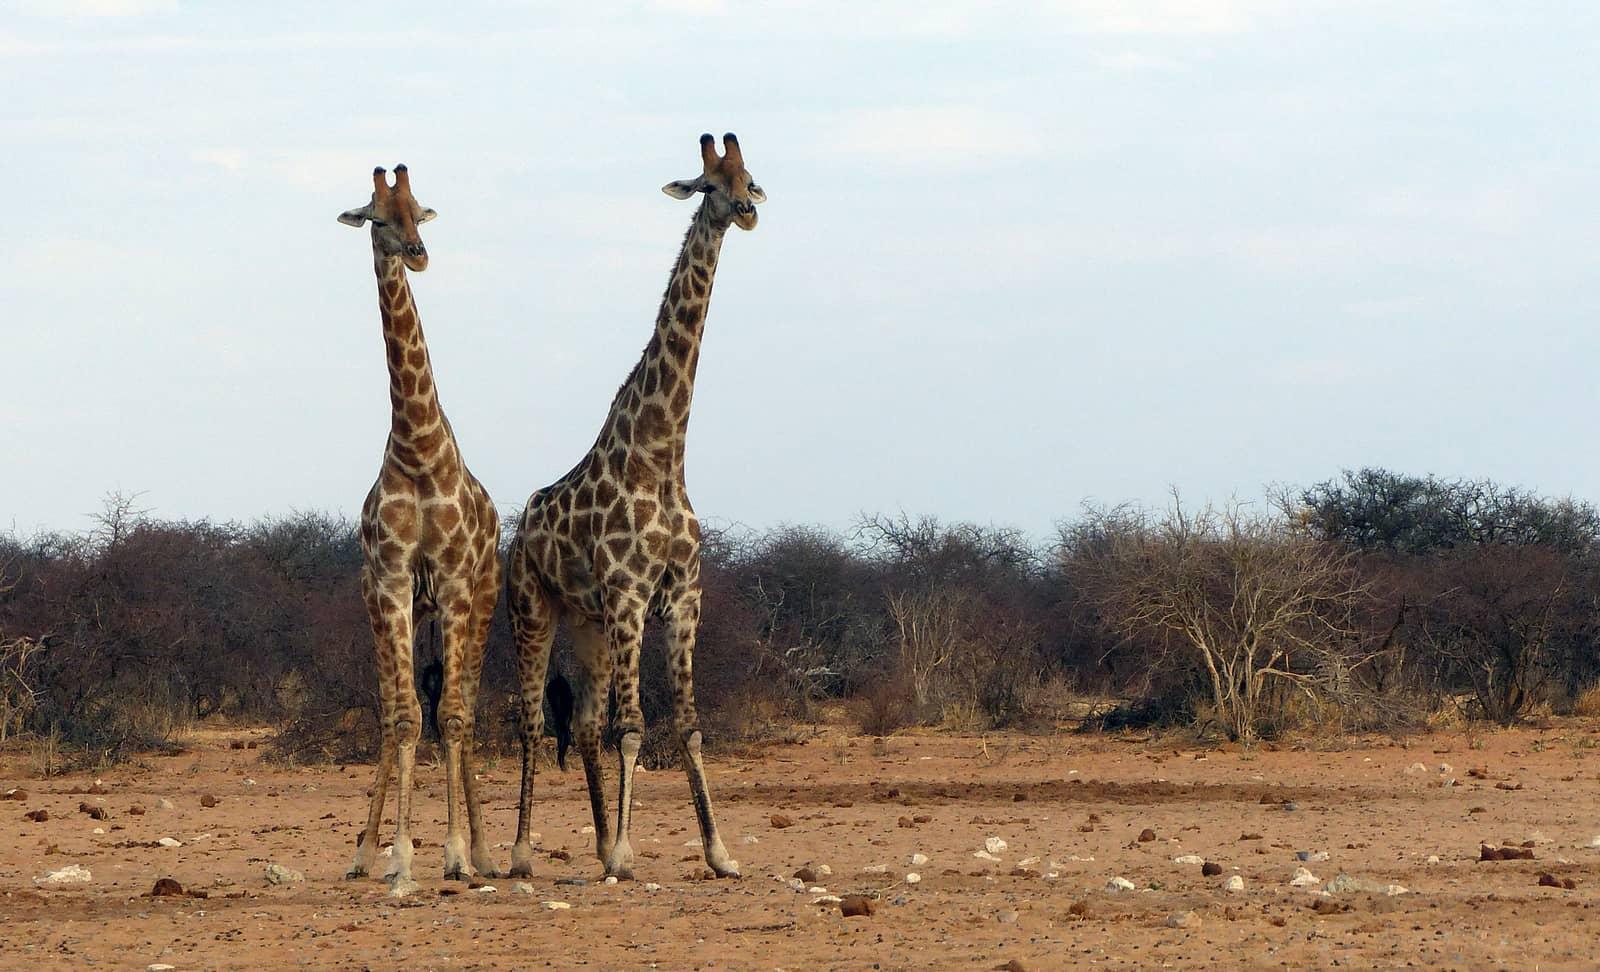 Giraffes at Tsumcor Waterhole, Namibia